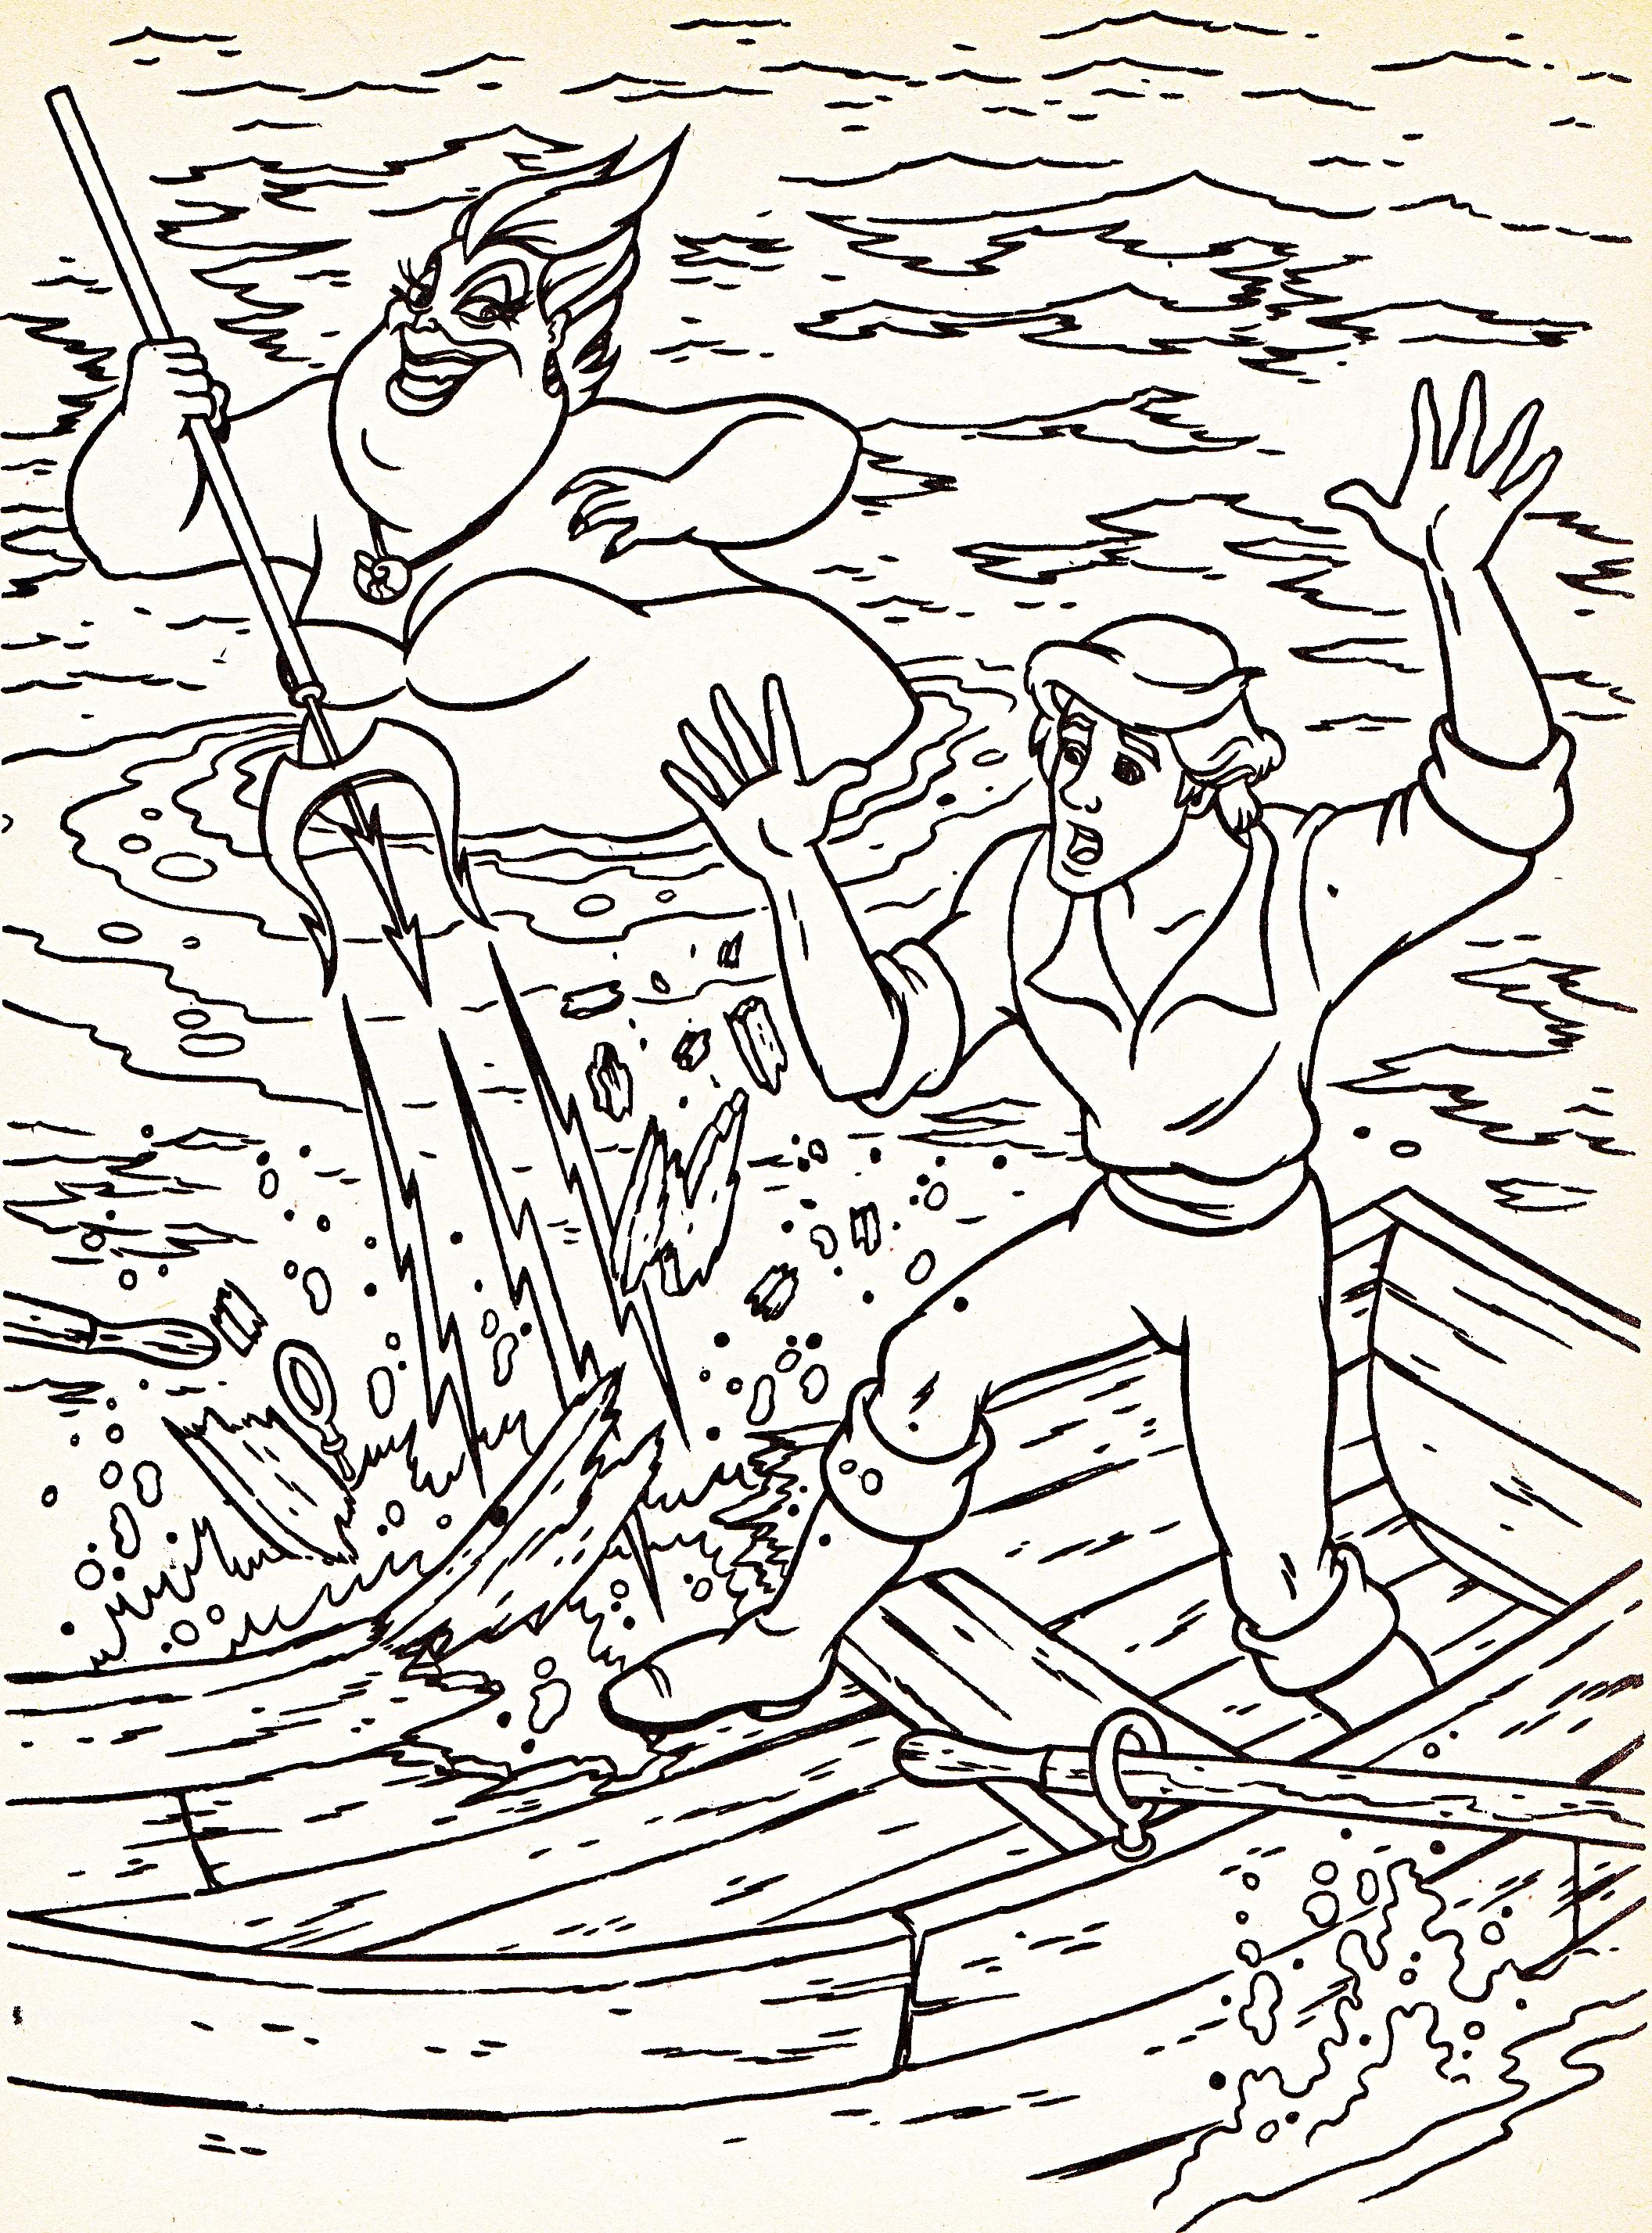 Walt Disney Coloring Pages - Ursula & Prince Eric - Walt ...